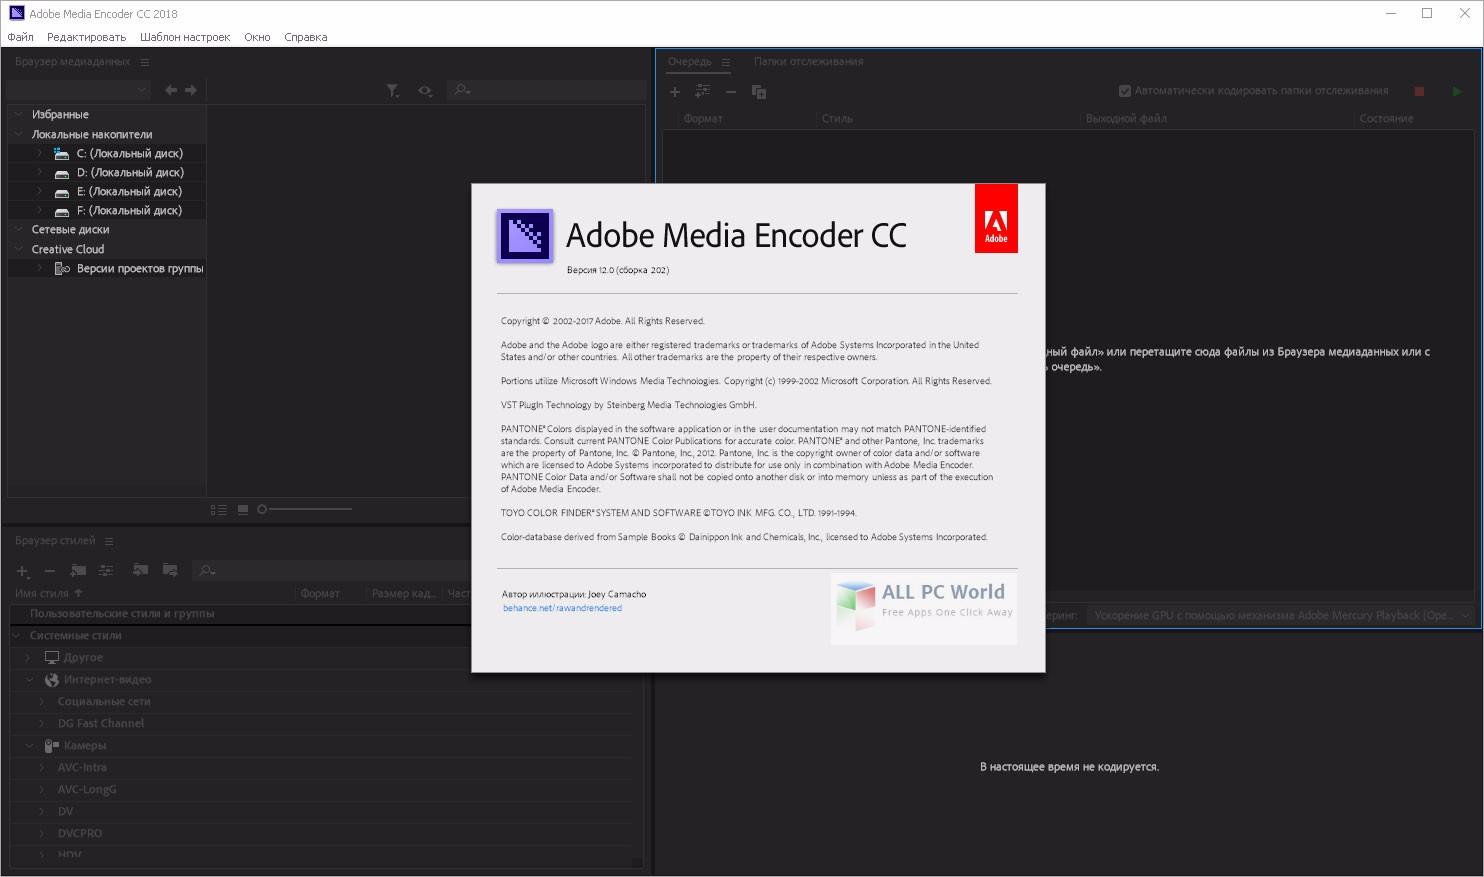 Adobe Media Encoder CC 2018 12.0 Review